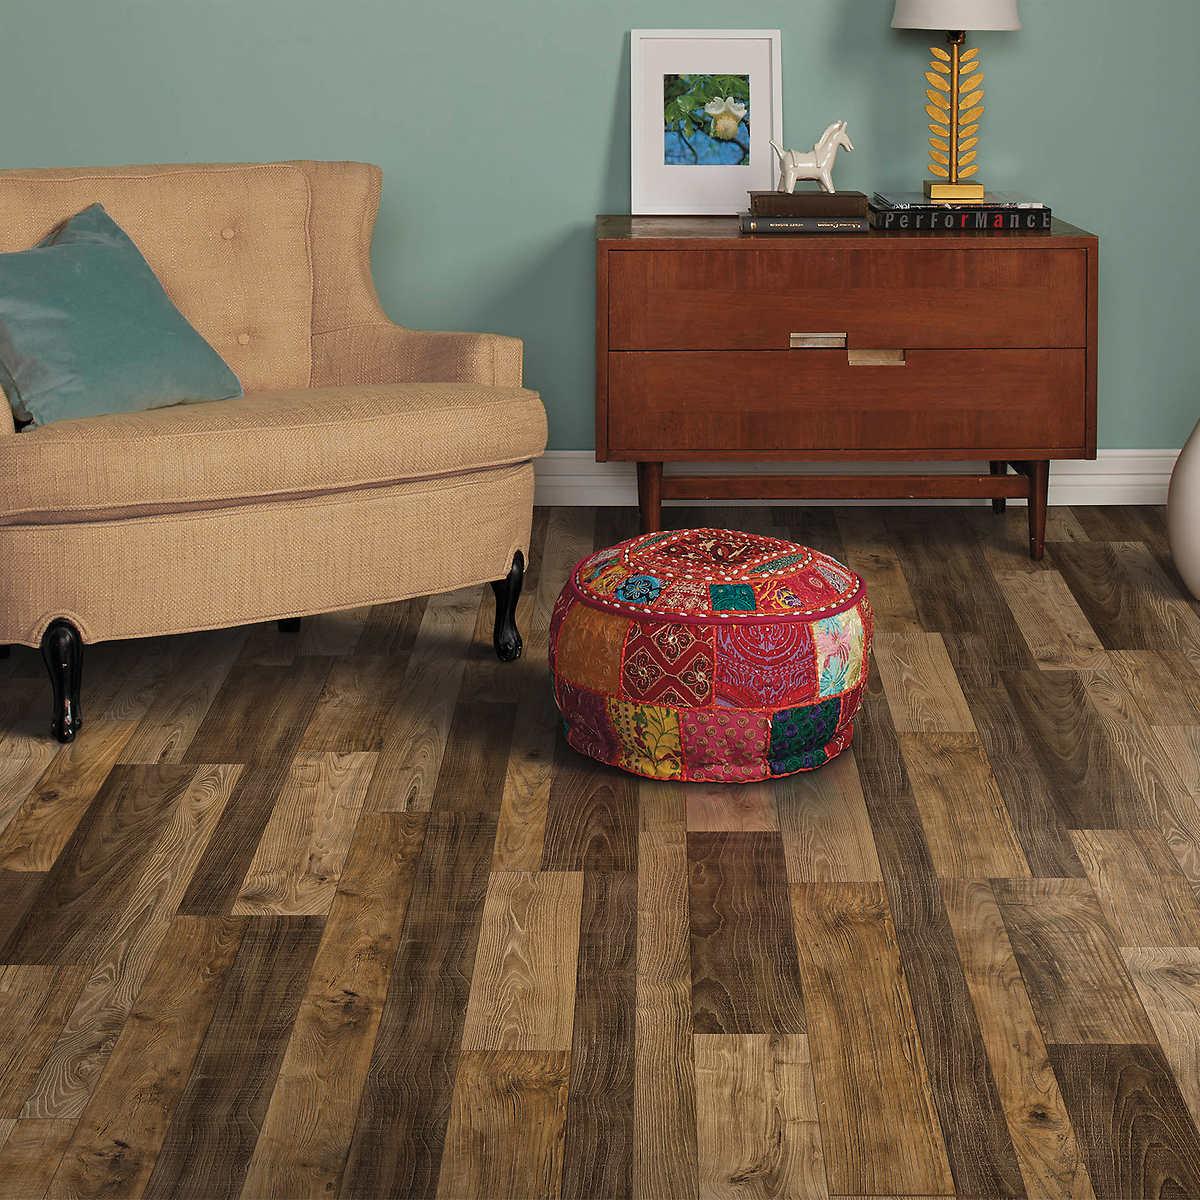 Harmonics Frontier Oak Flooring 22.09 SQ FT Per Box - Laminate Flooring Costco